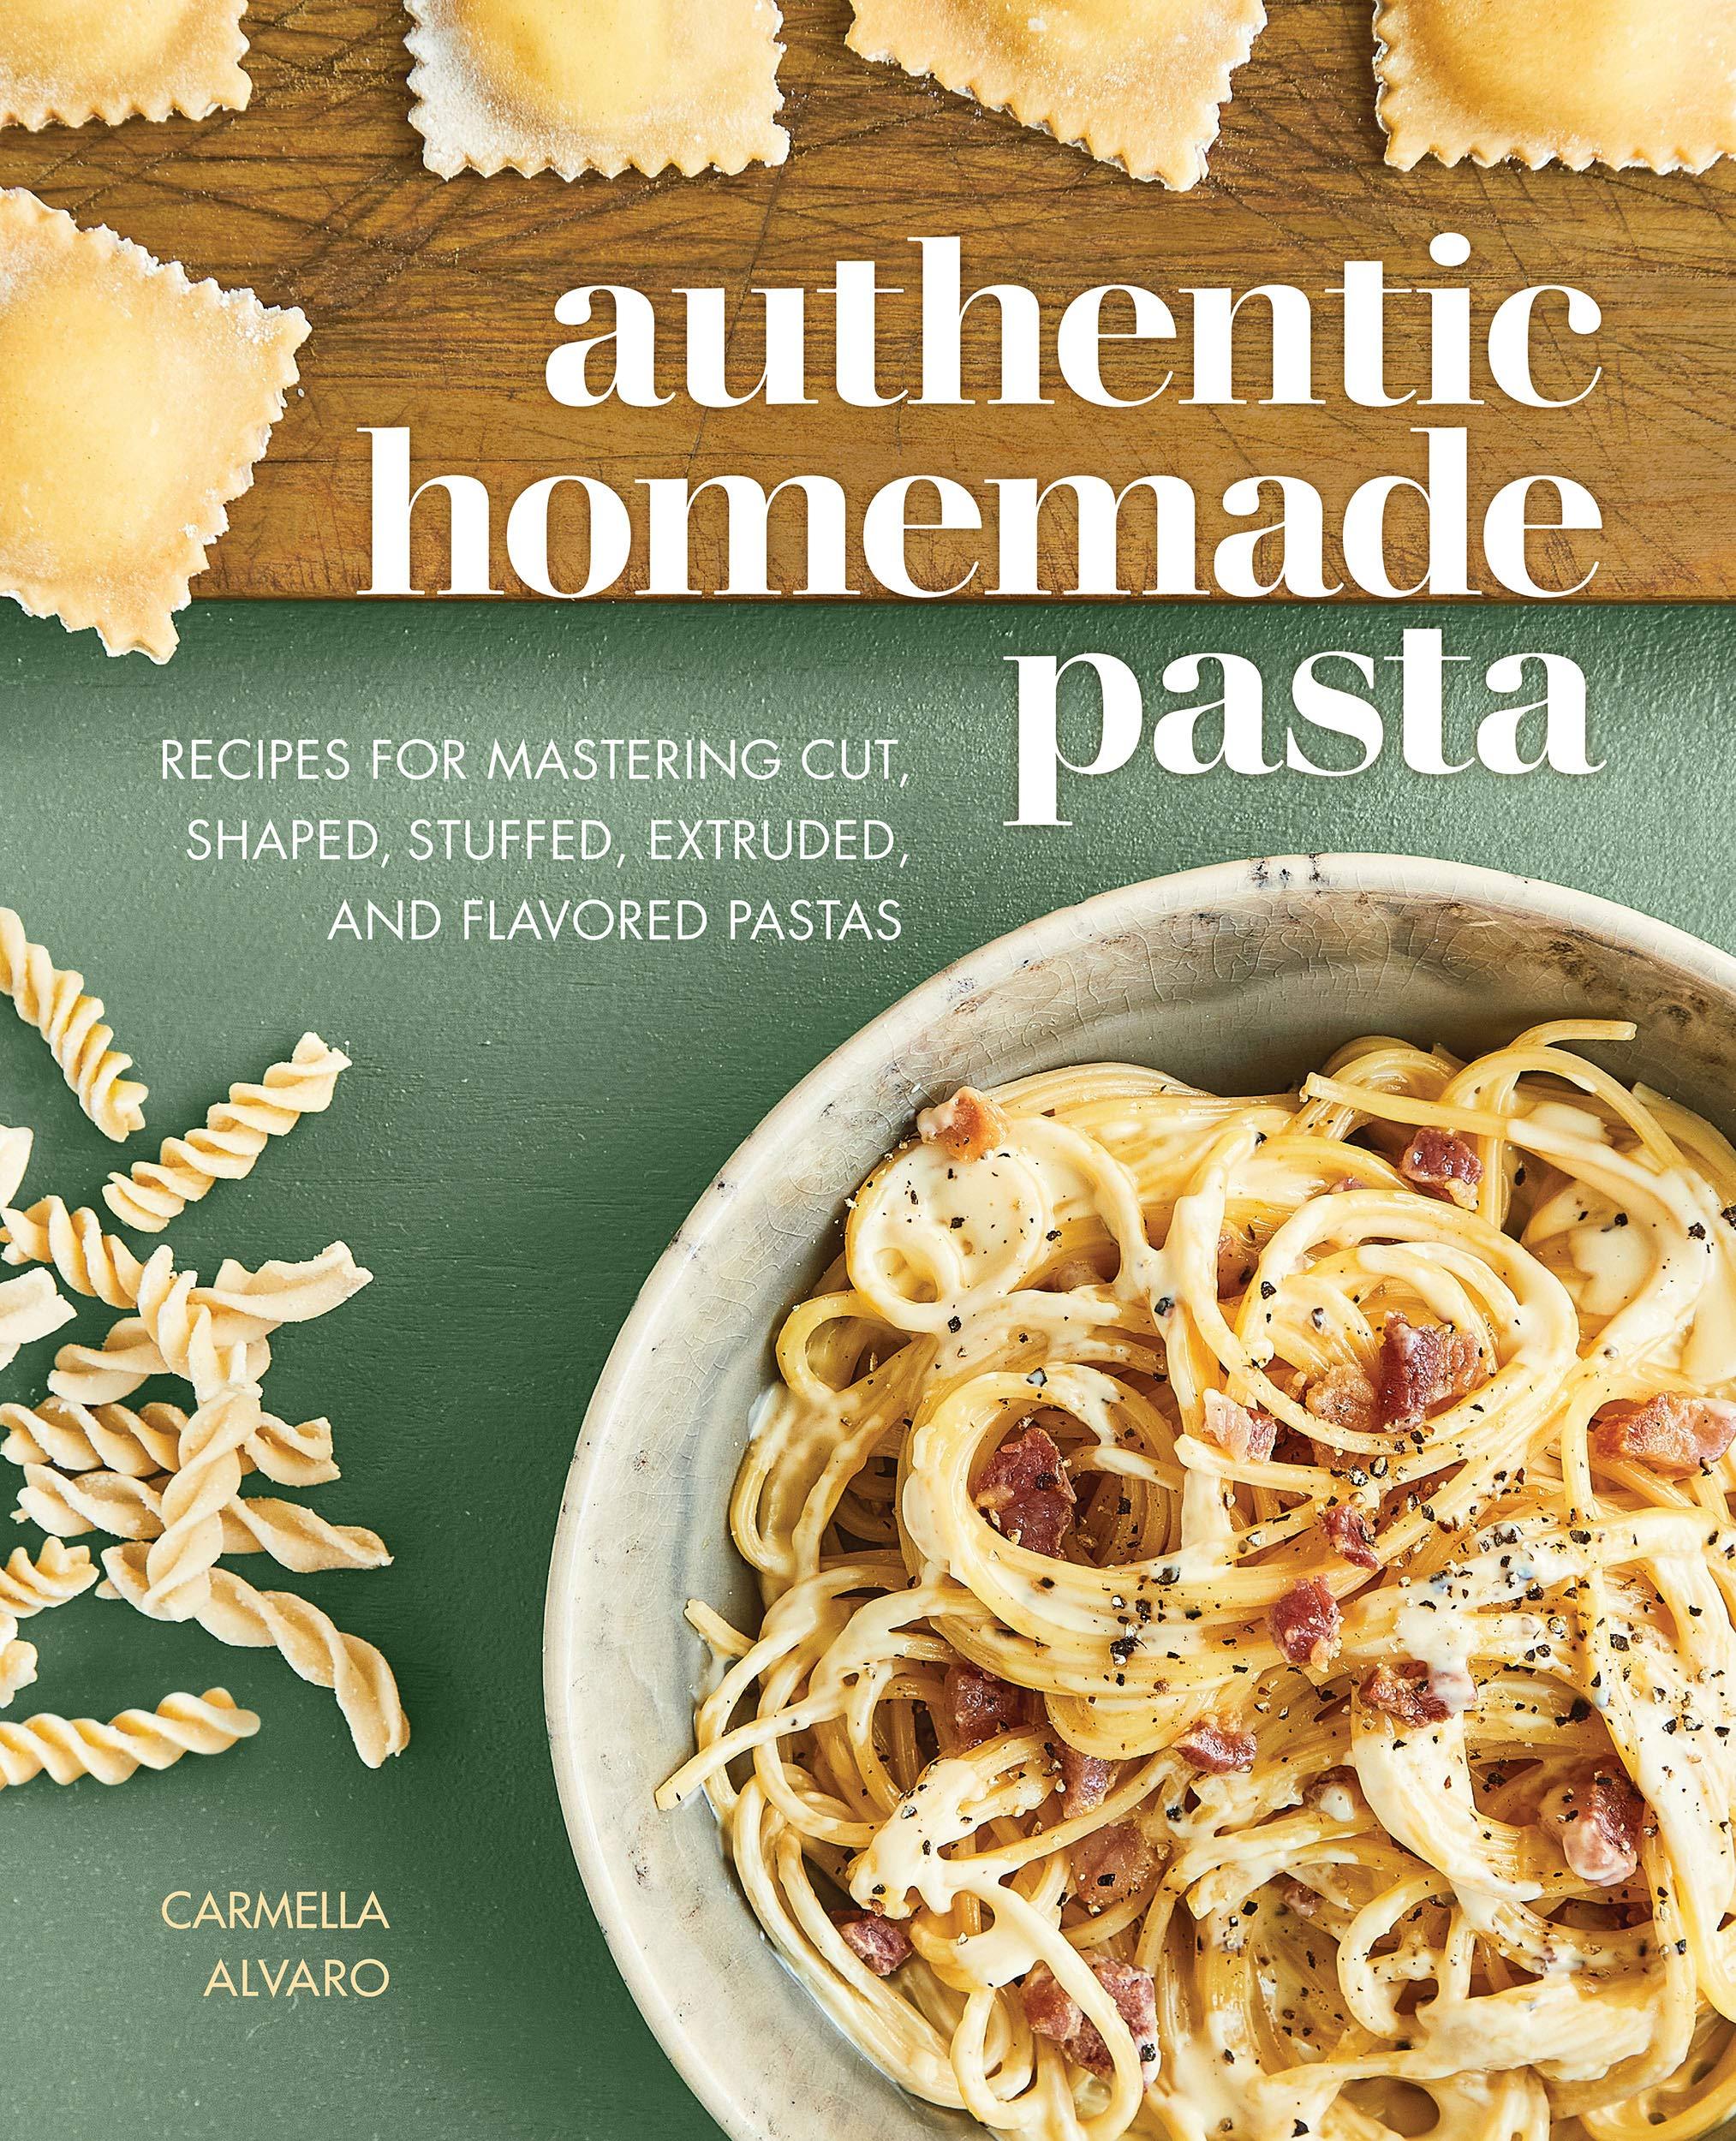 Authentic Homemade Pasta Recipes For Mastering Cut Shaped Stuffed Extruded And Flavored Pastas Alvaro Carmella 9781647397449 Amazon Com Books